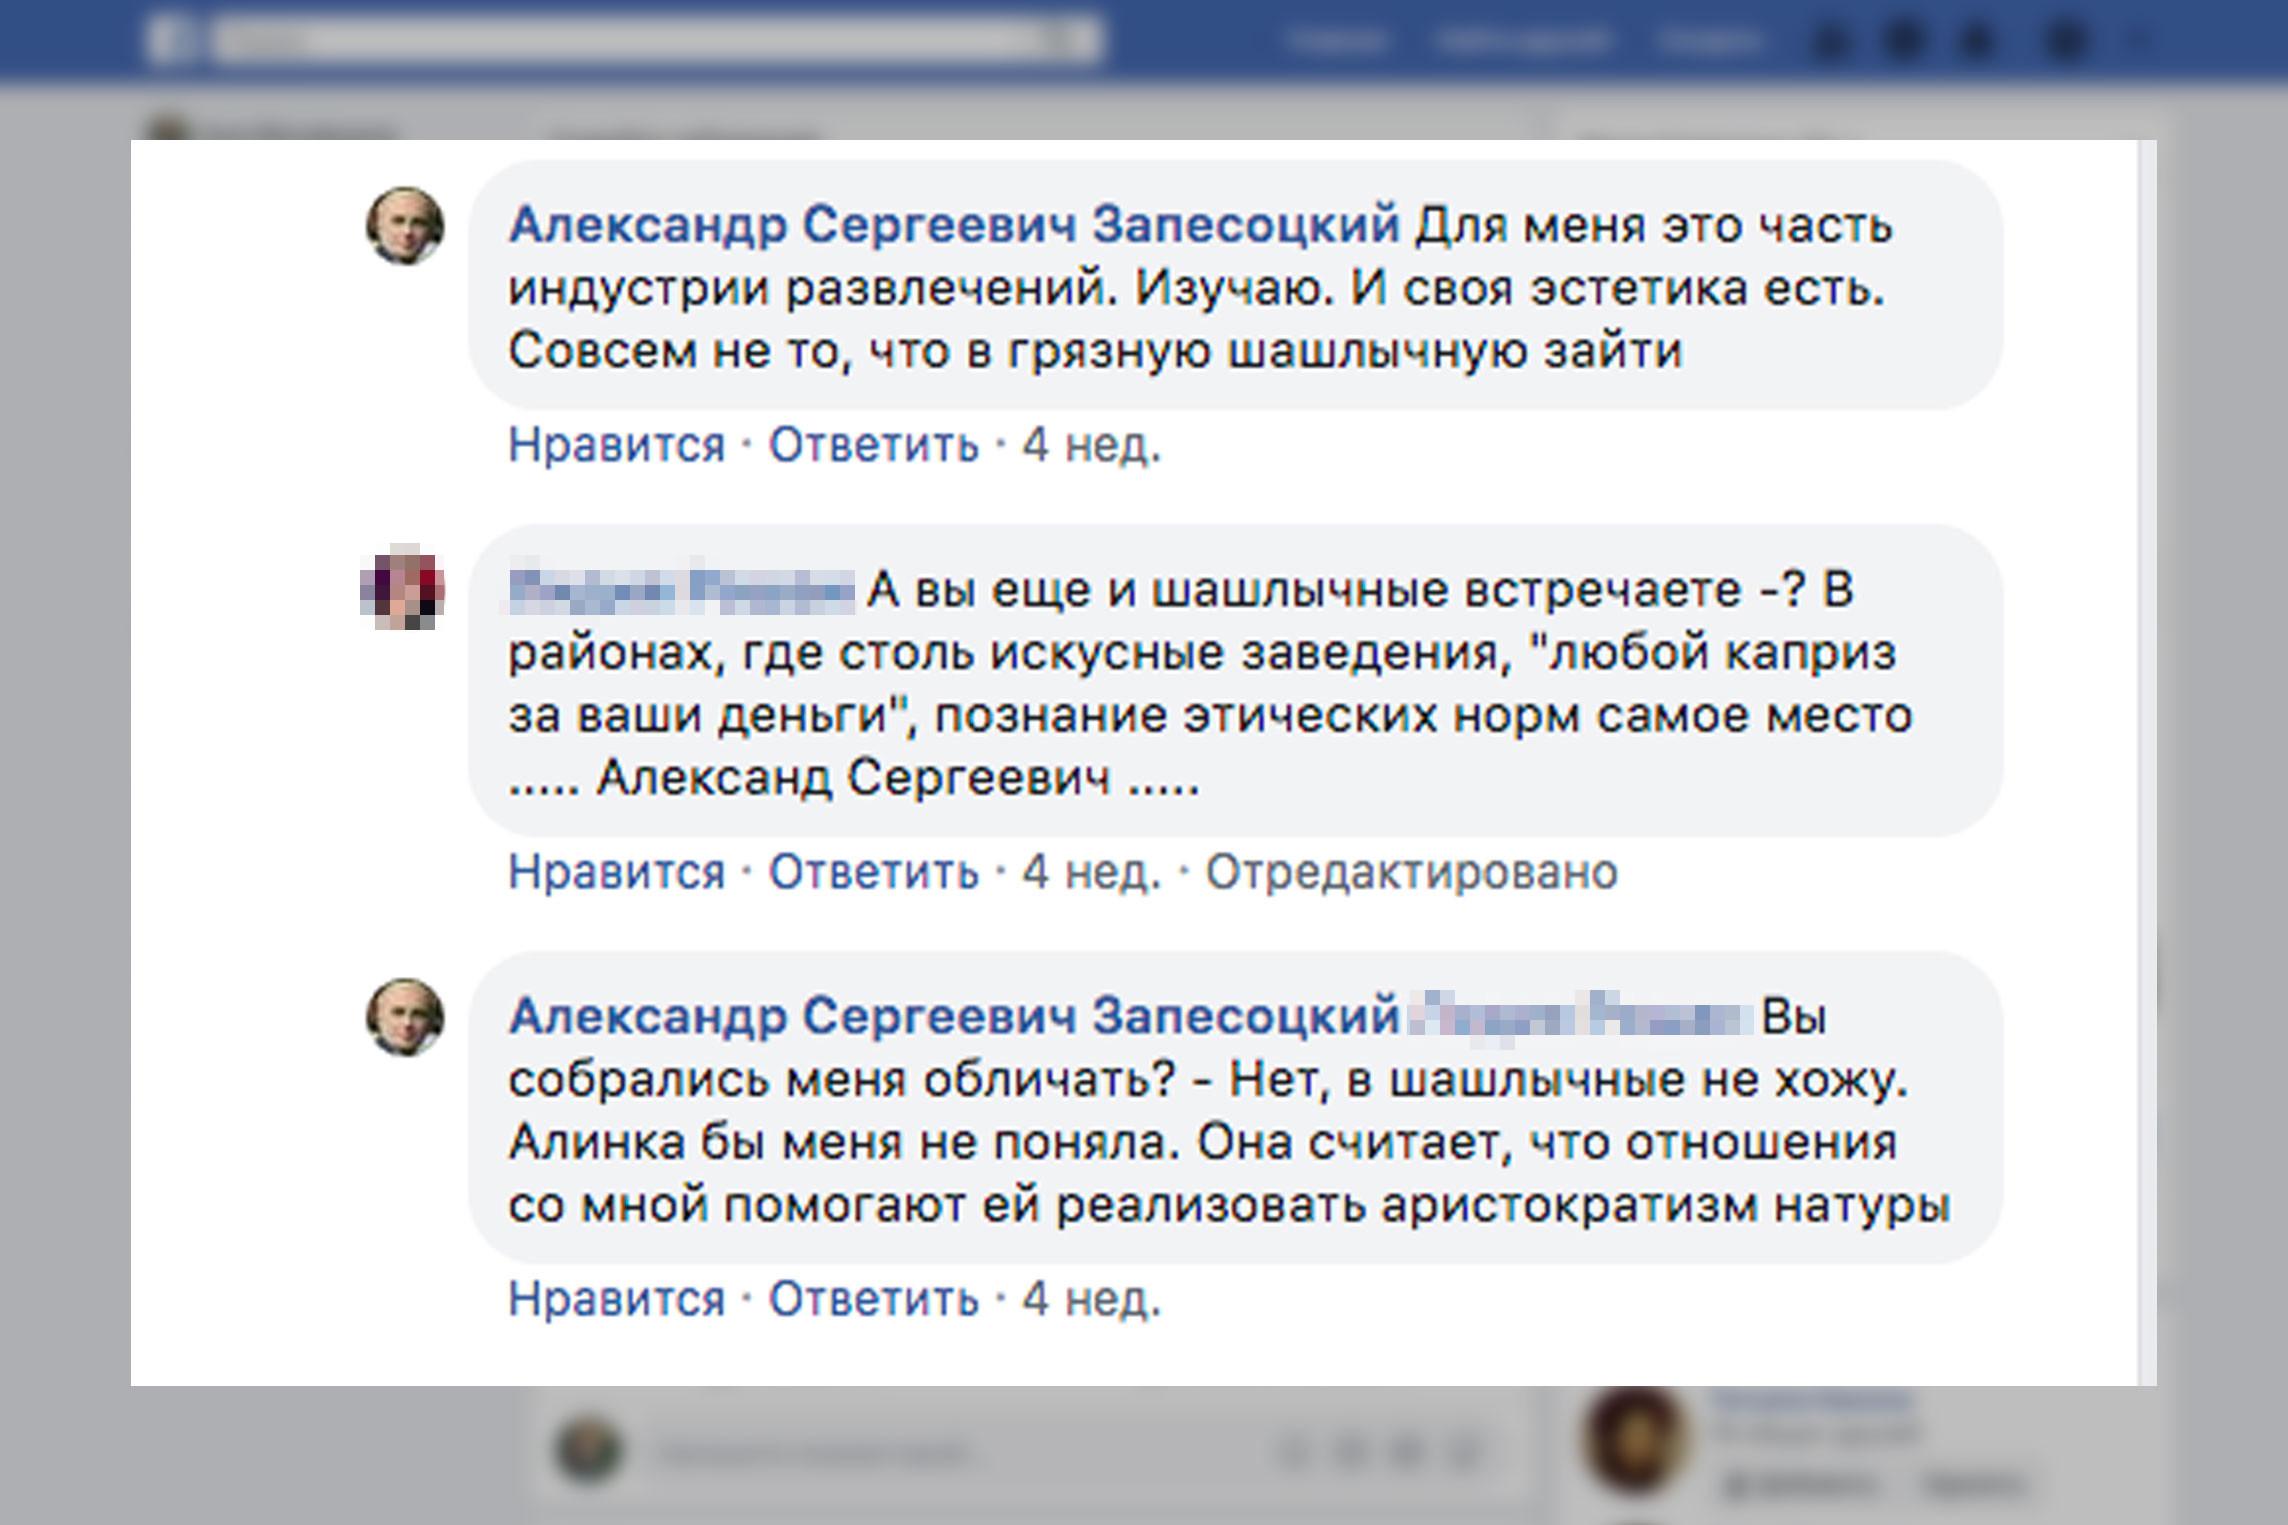 © Facebook / Александр Сергеевич Запесоцкий